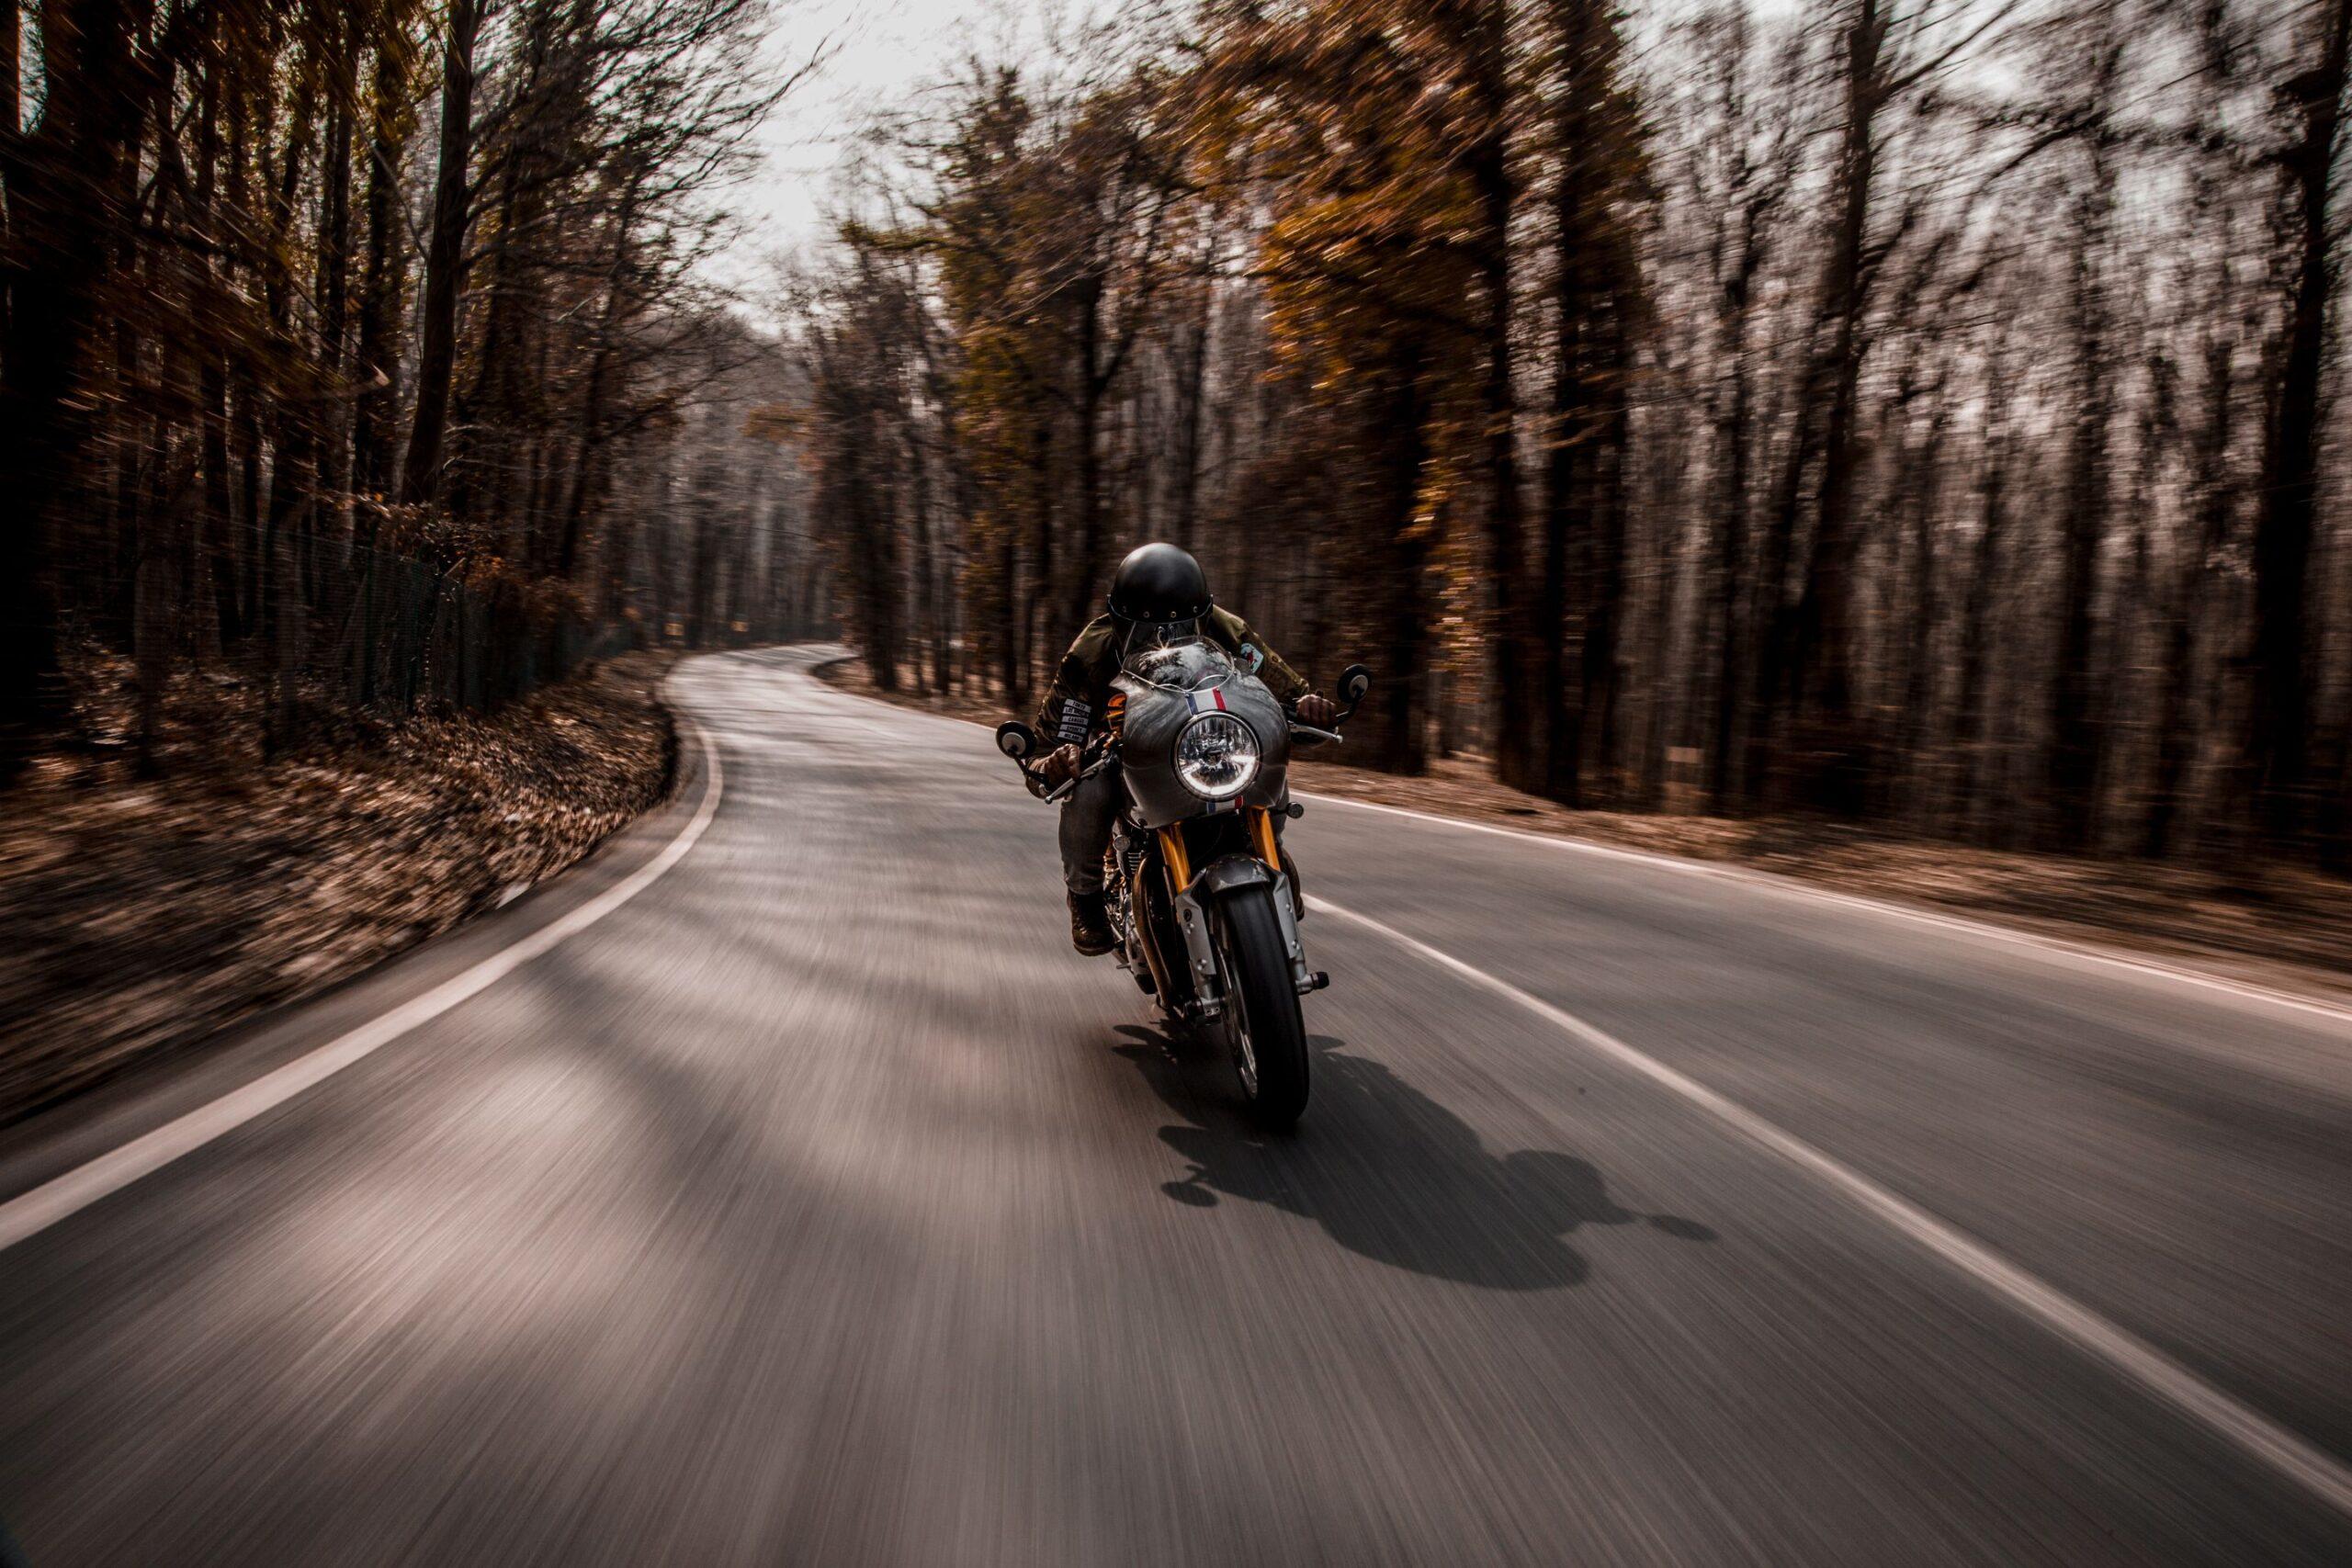 surucu-kursu-motosiklet